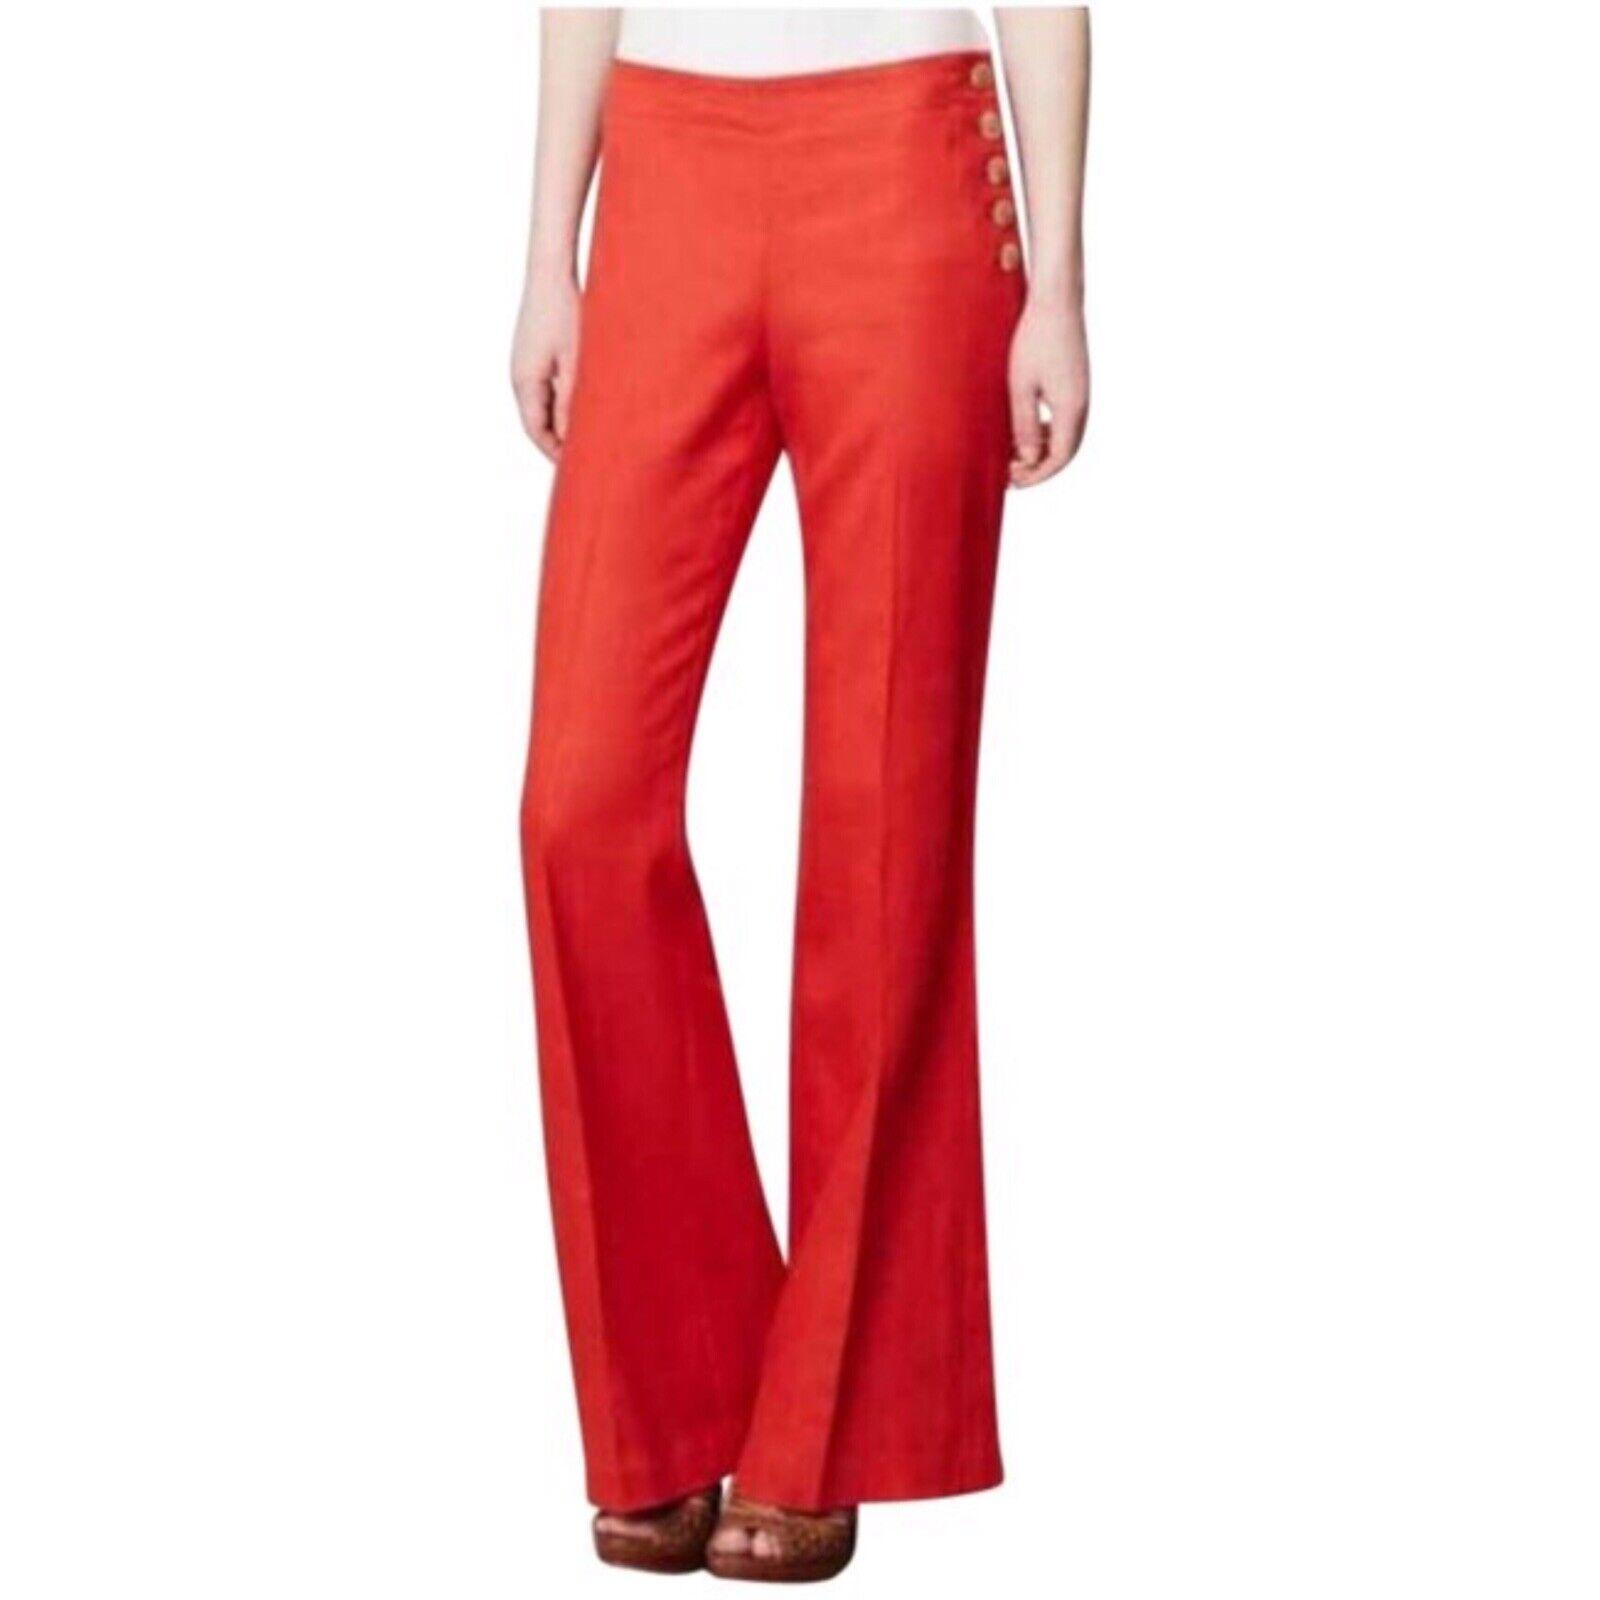 Anthropologie Women's Red Elevenses Edisto Linen pants Size 4